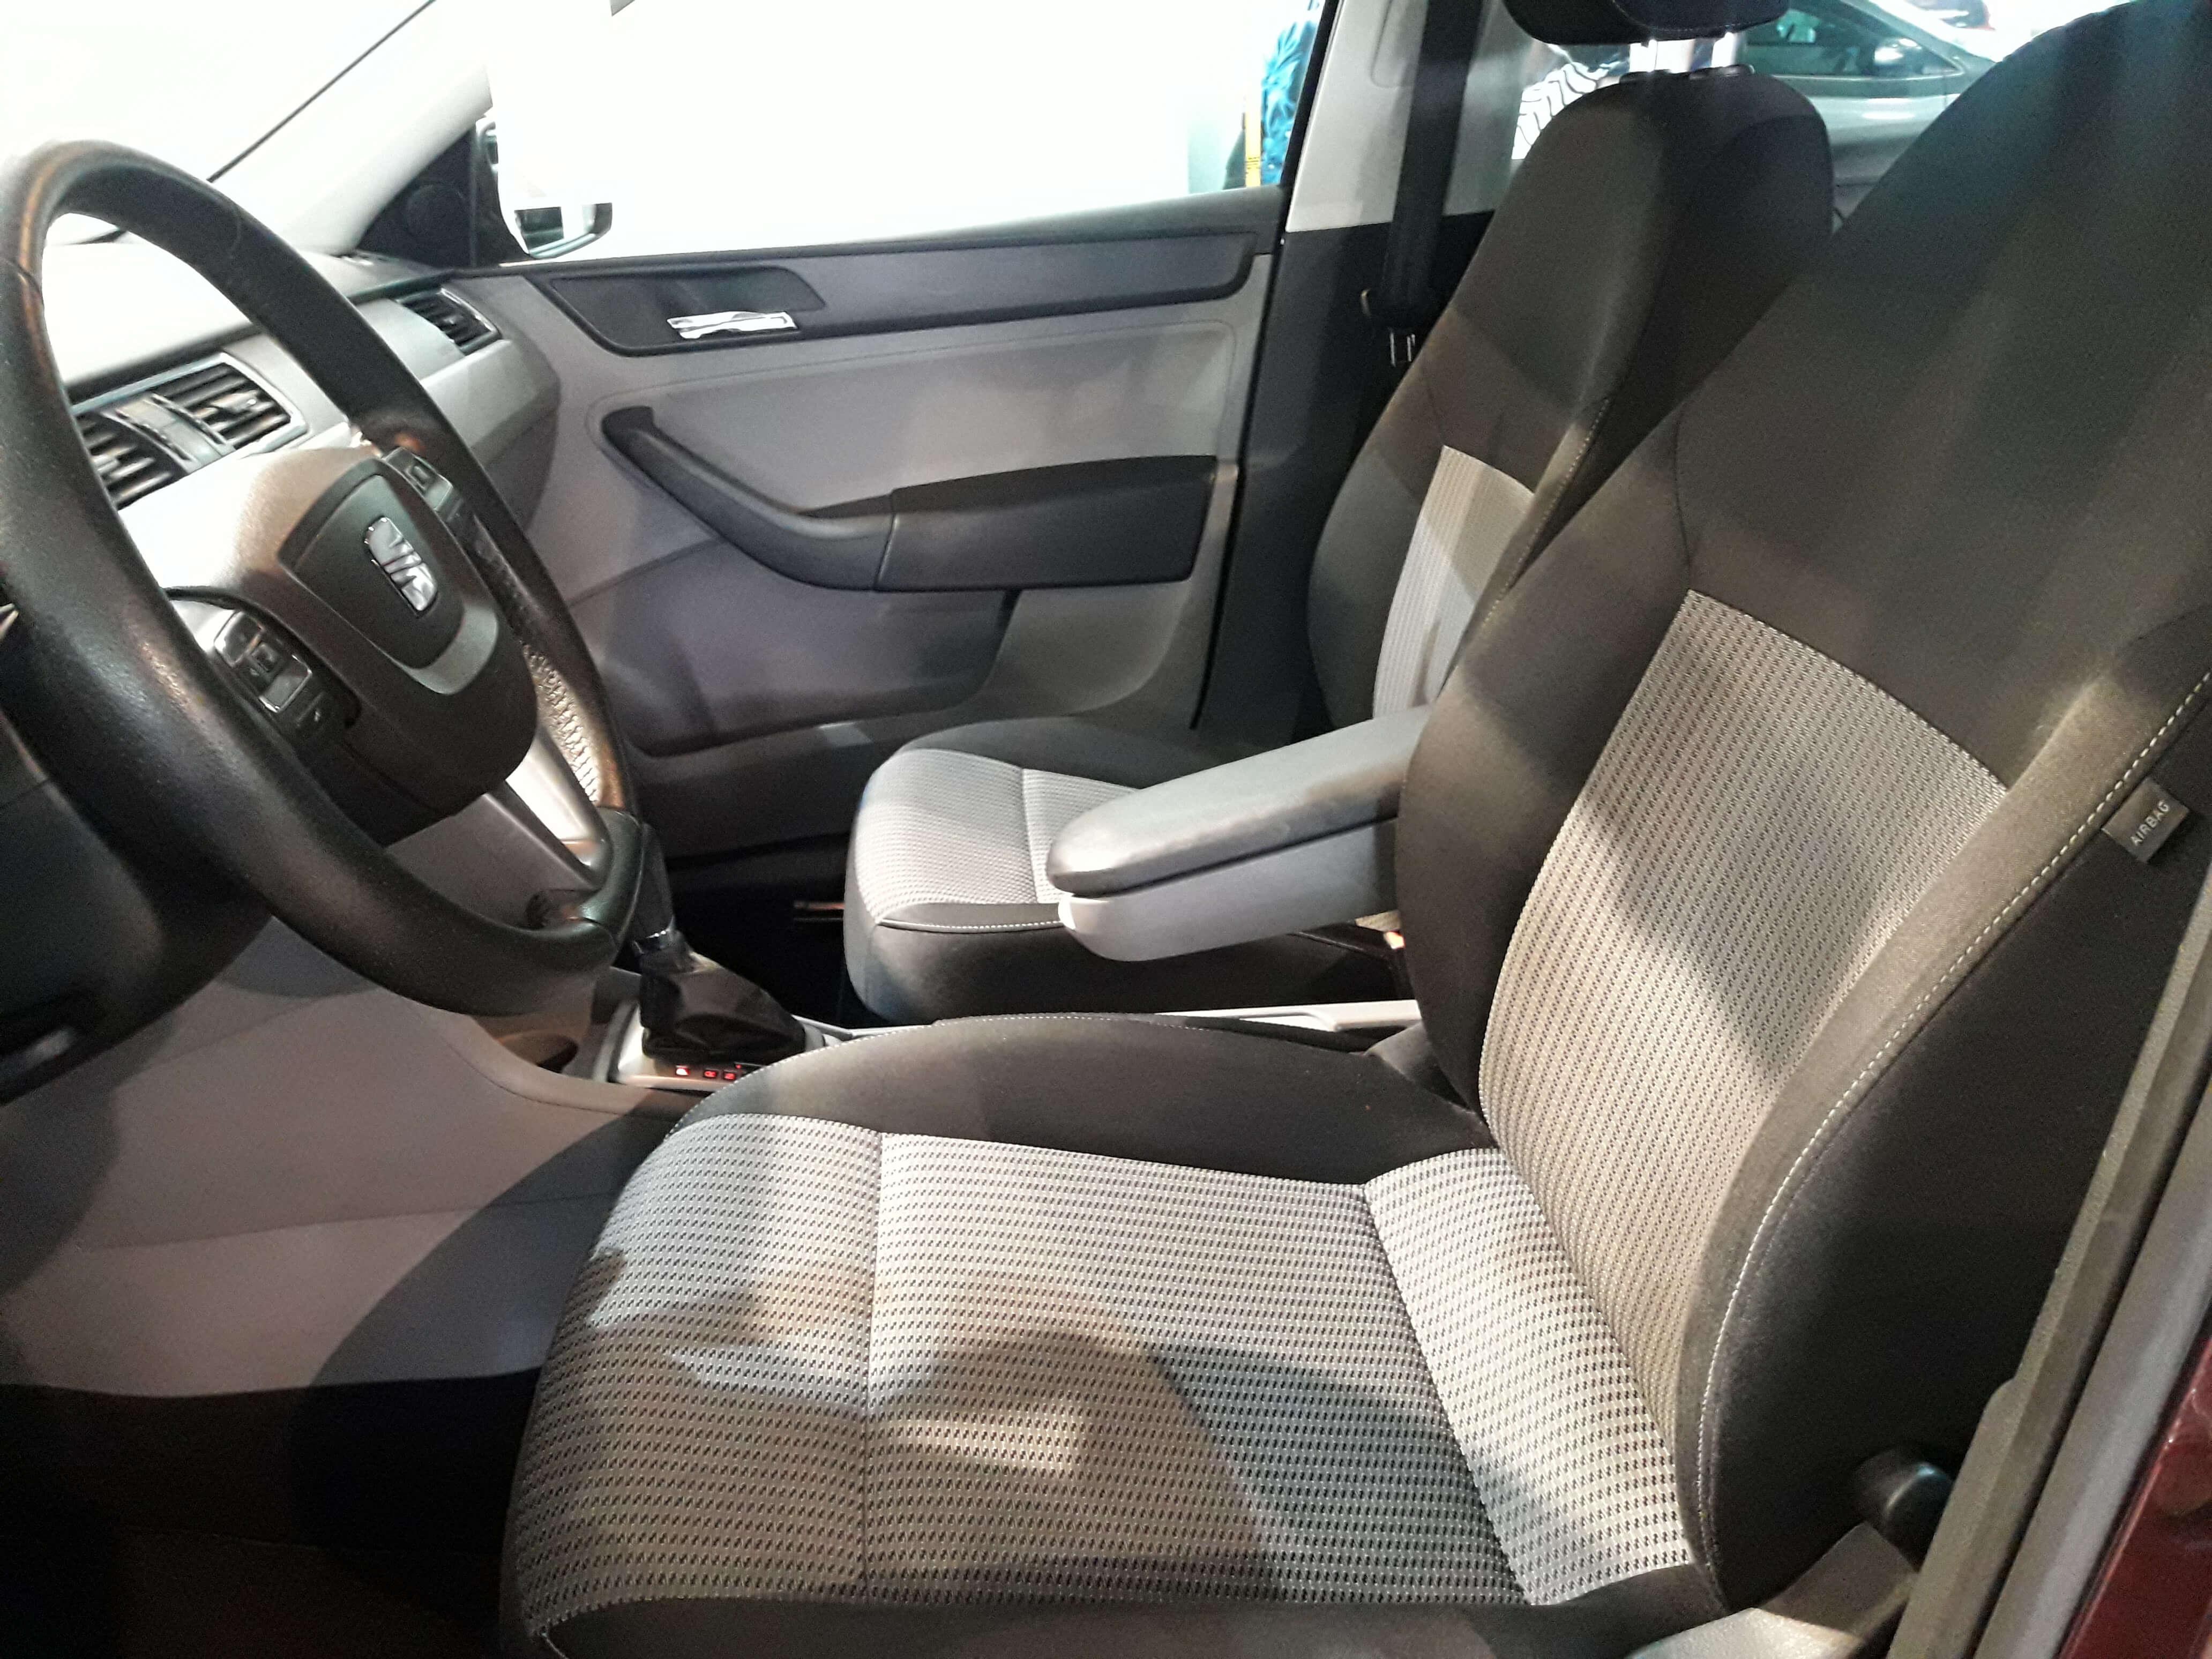 SEAT Toledo Atrás 16